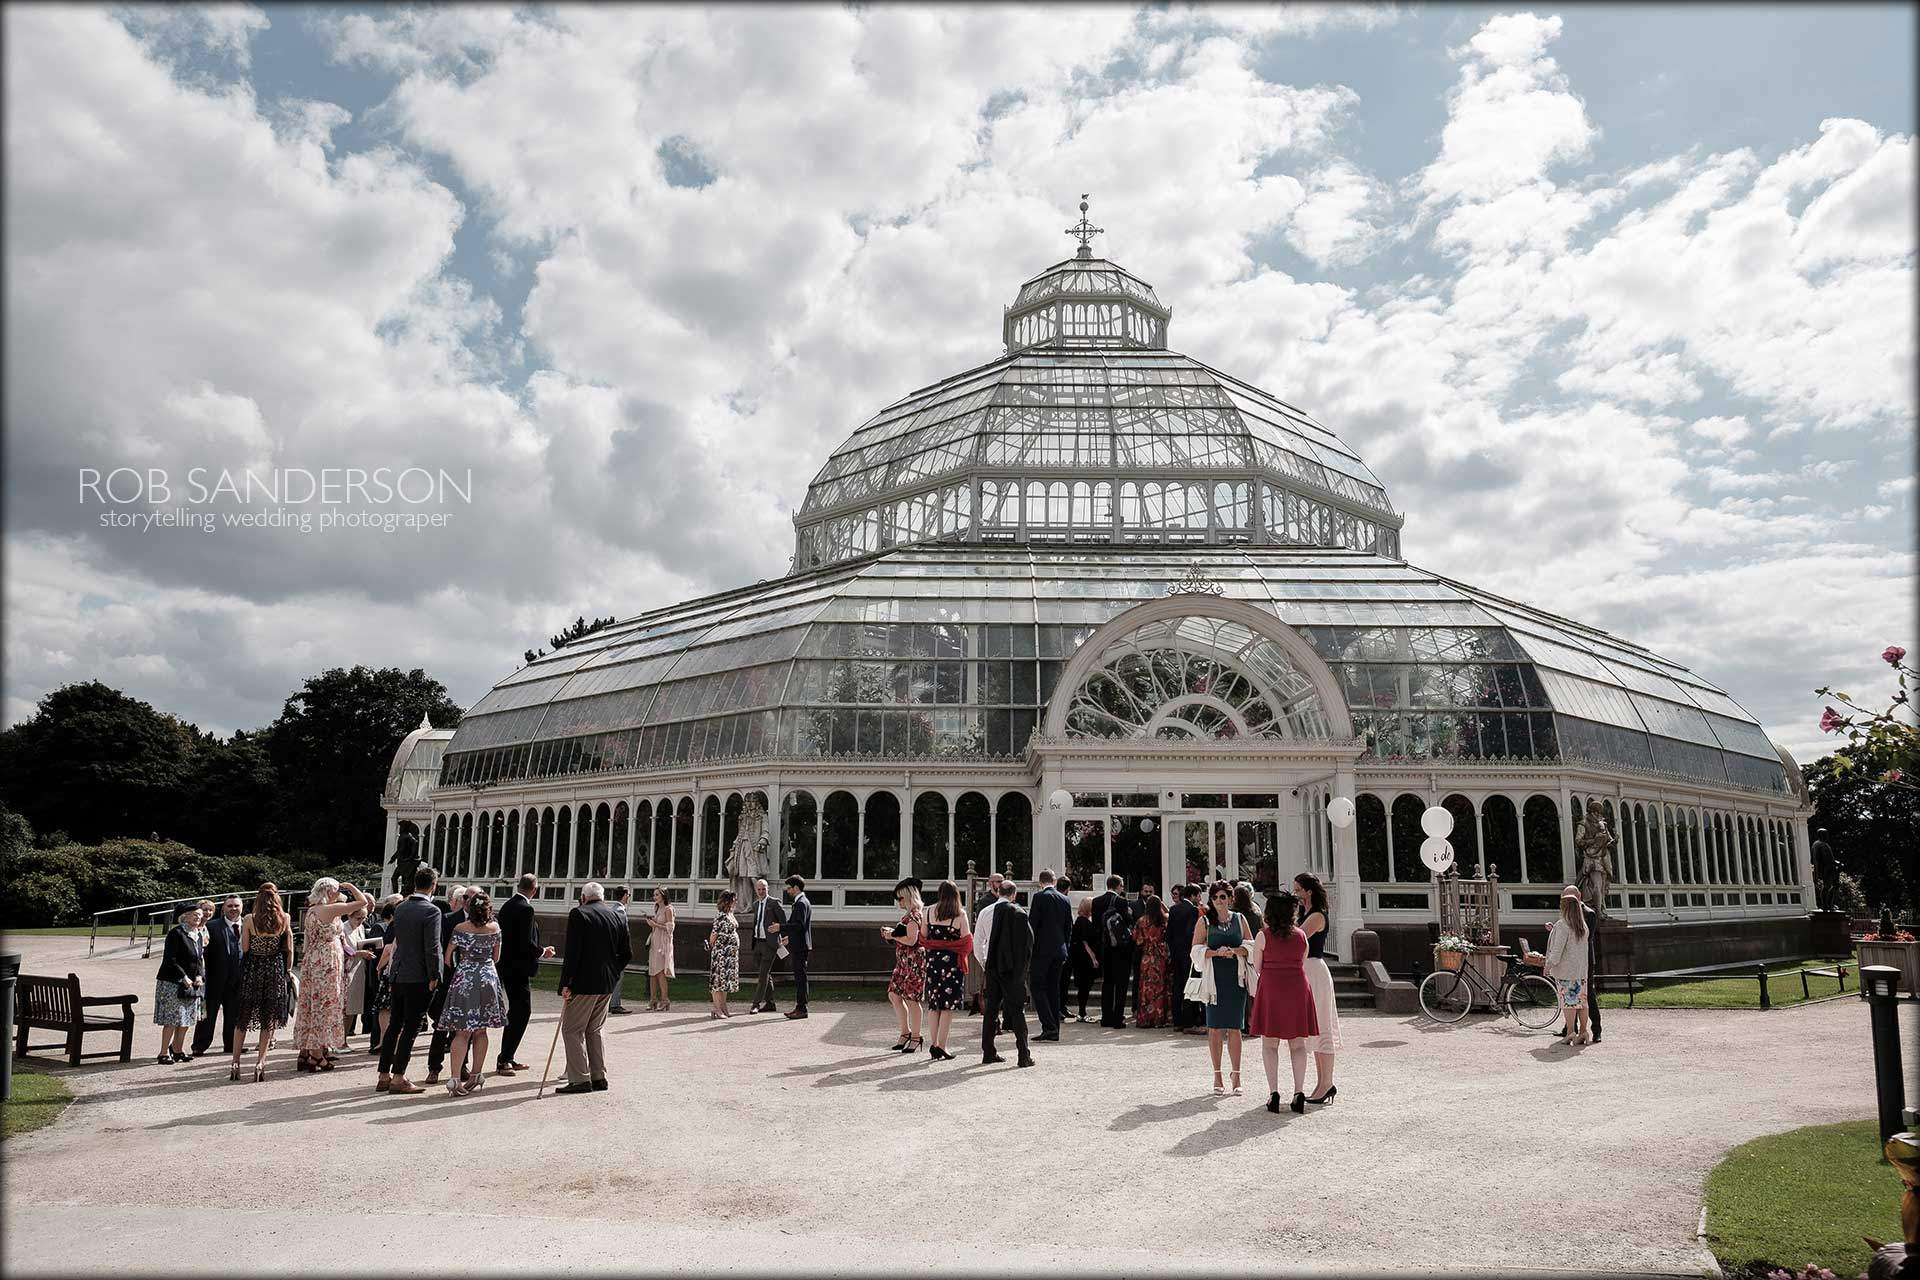 The Sefton Park Palm house